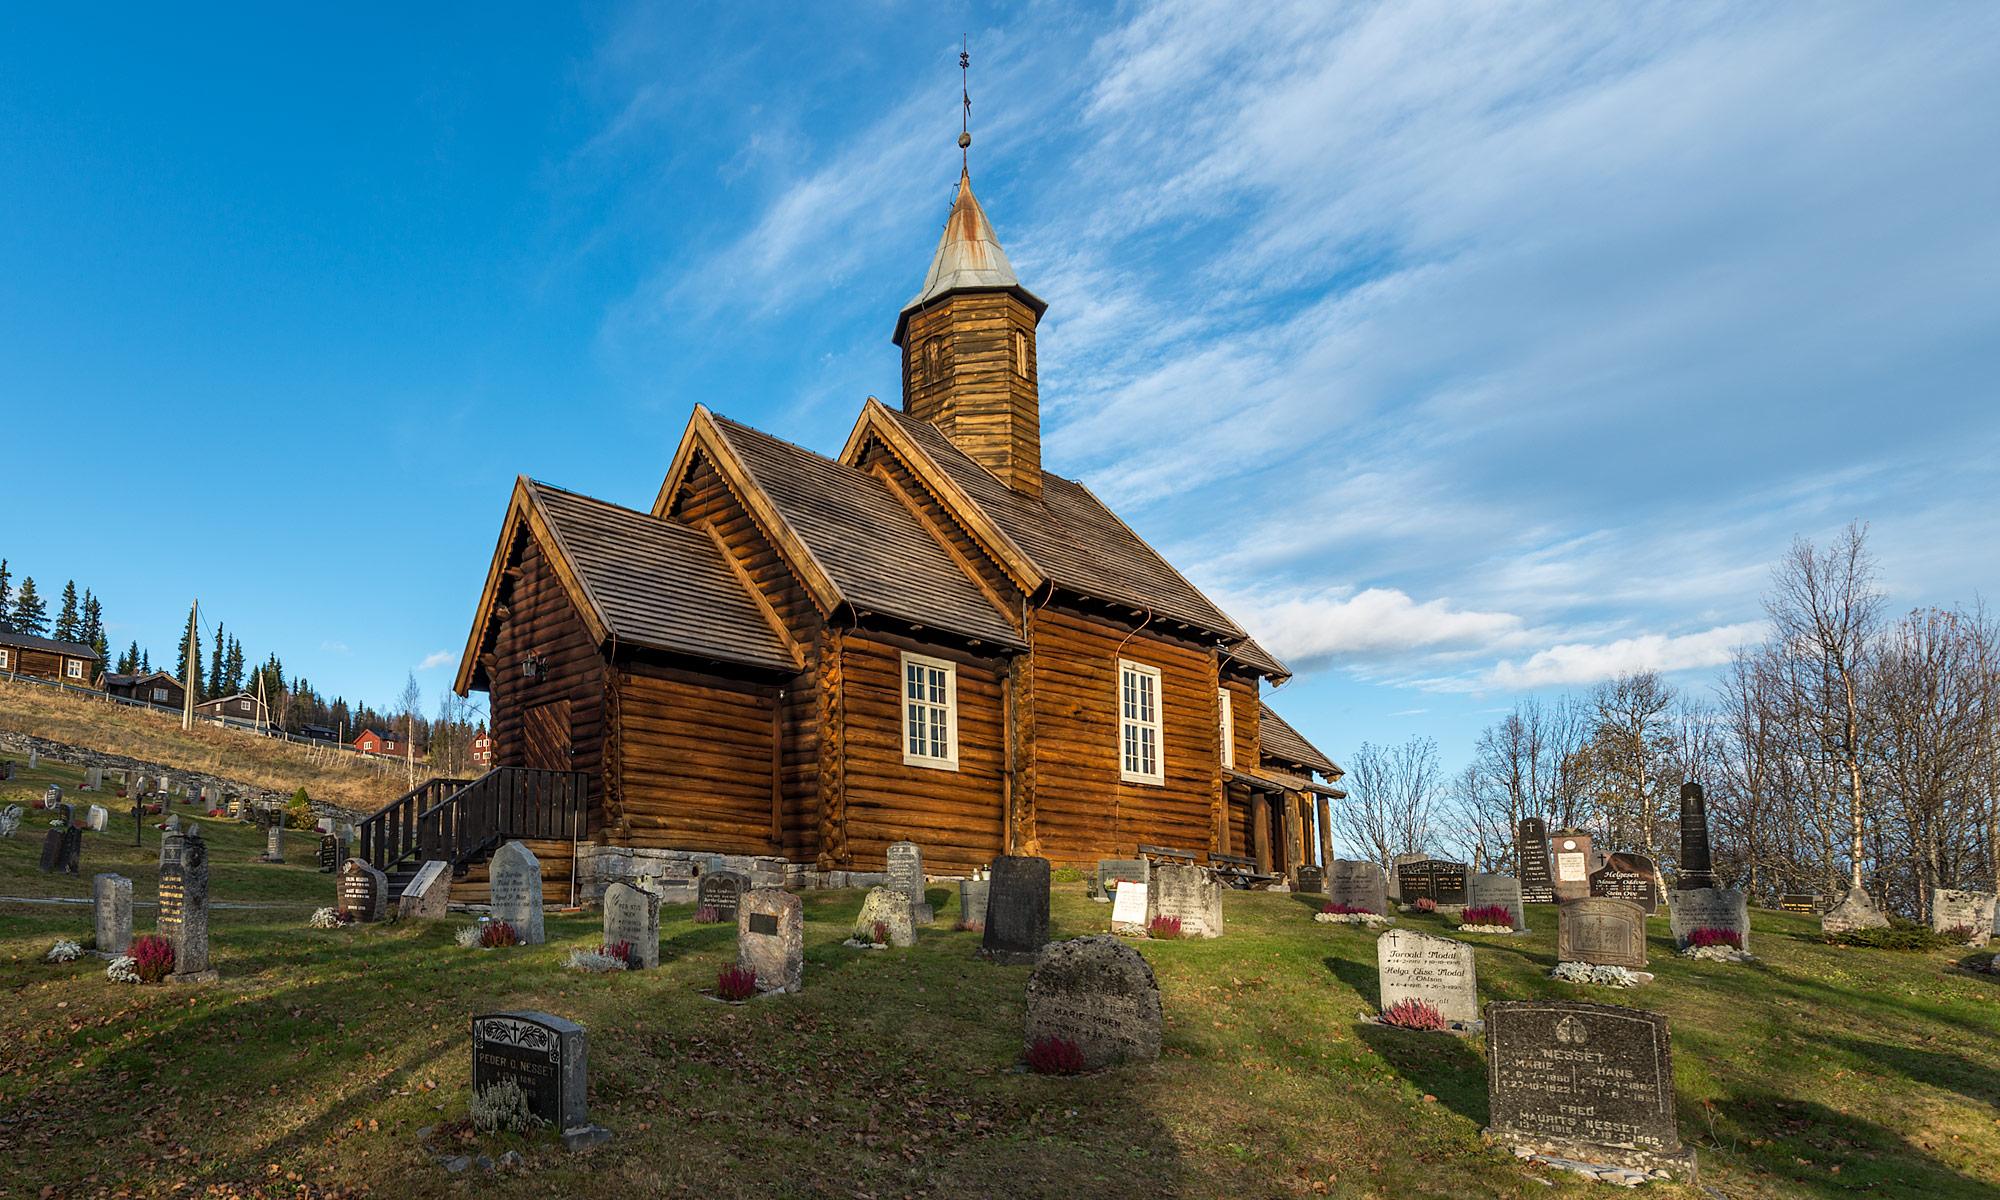 Sollia kirke, church, Sollia, Norway – Landscape Photography